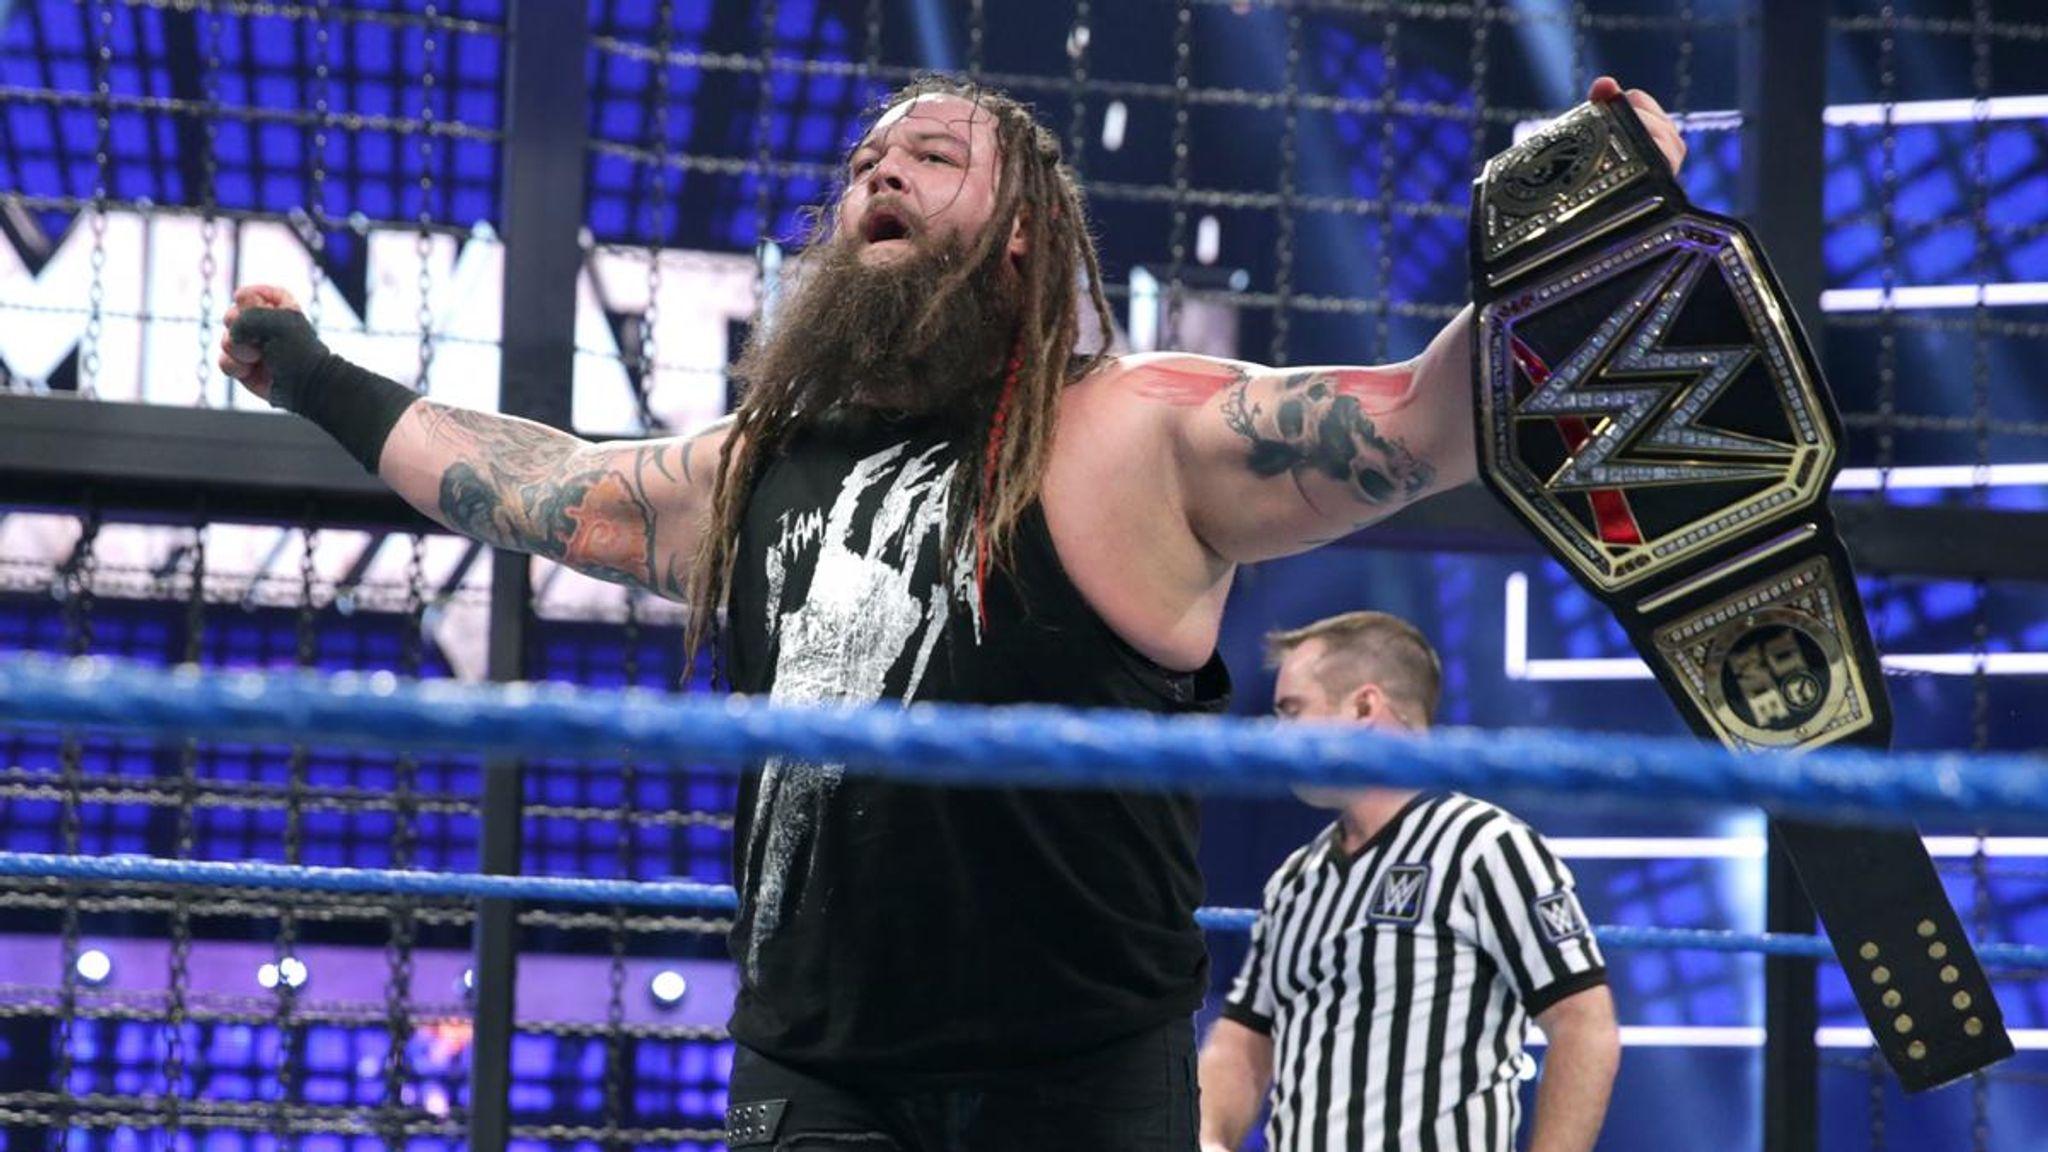 Bray Wyatt wins first WWE Title inside the Elimination Chamber | WWE News |  Sky Sports